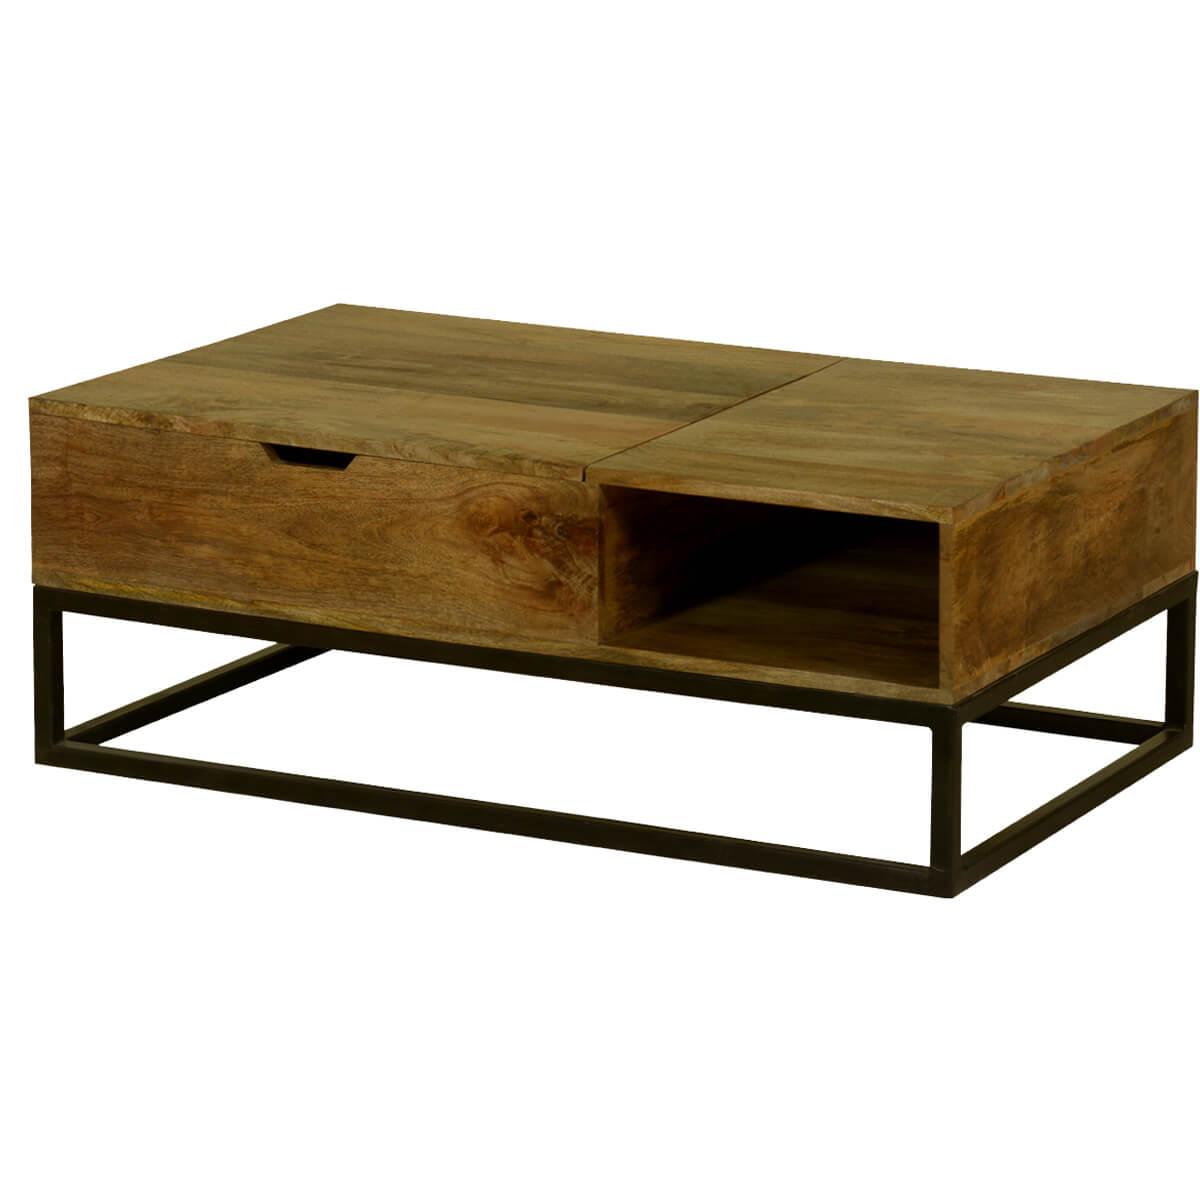 Modern Industrial Mango Wood & Iron Coffee Table Chest